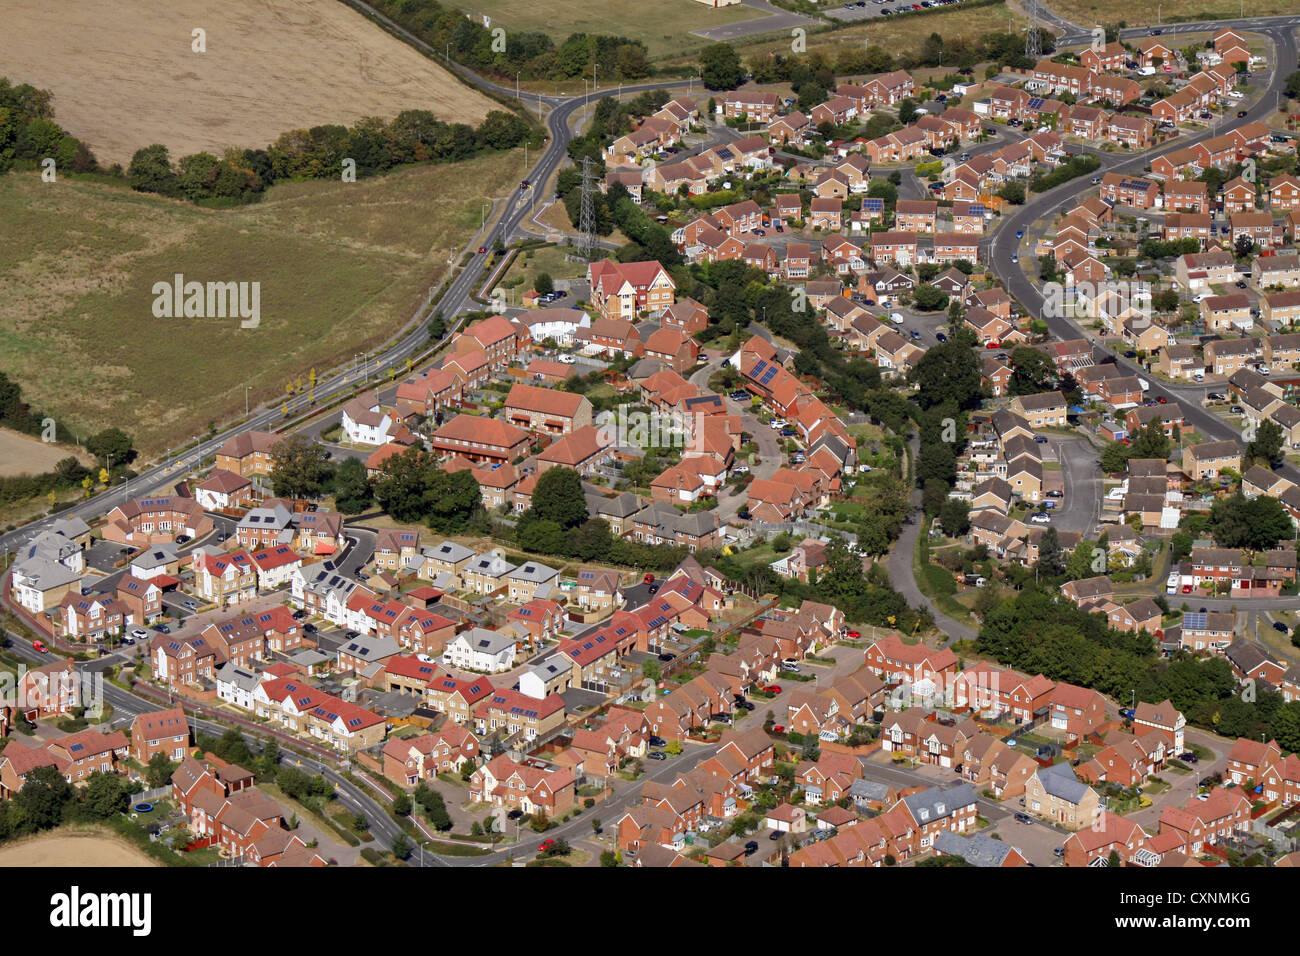 Vista aérea de casas modernas Imagen De Stock